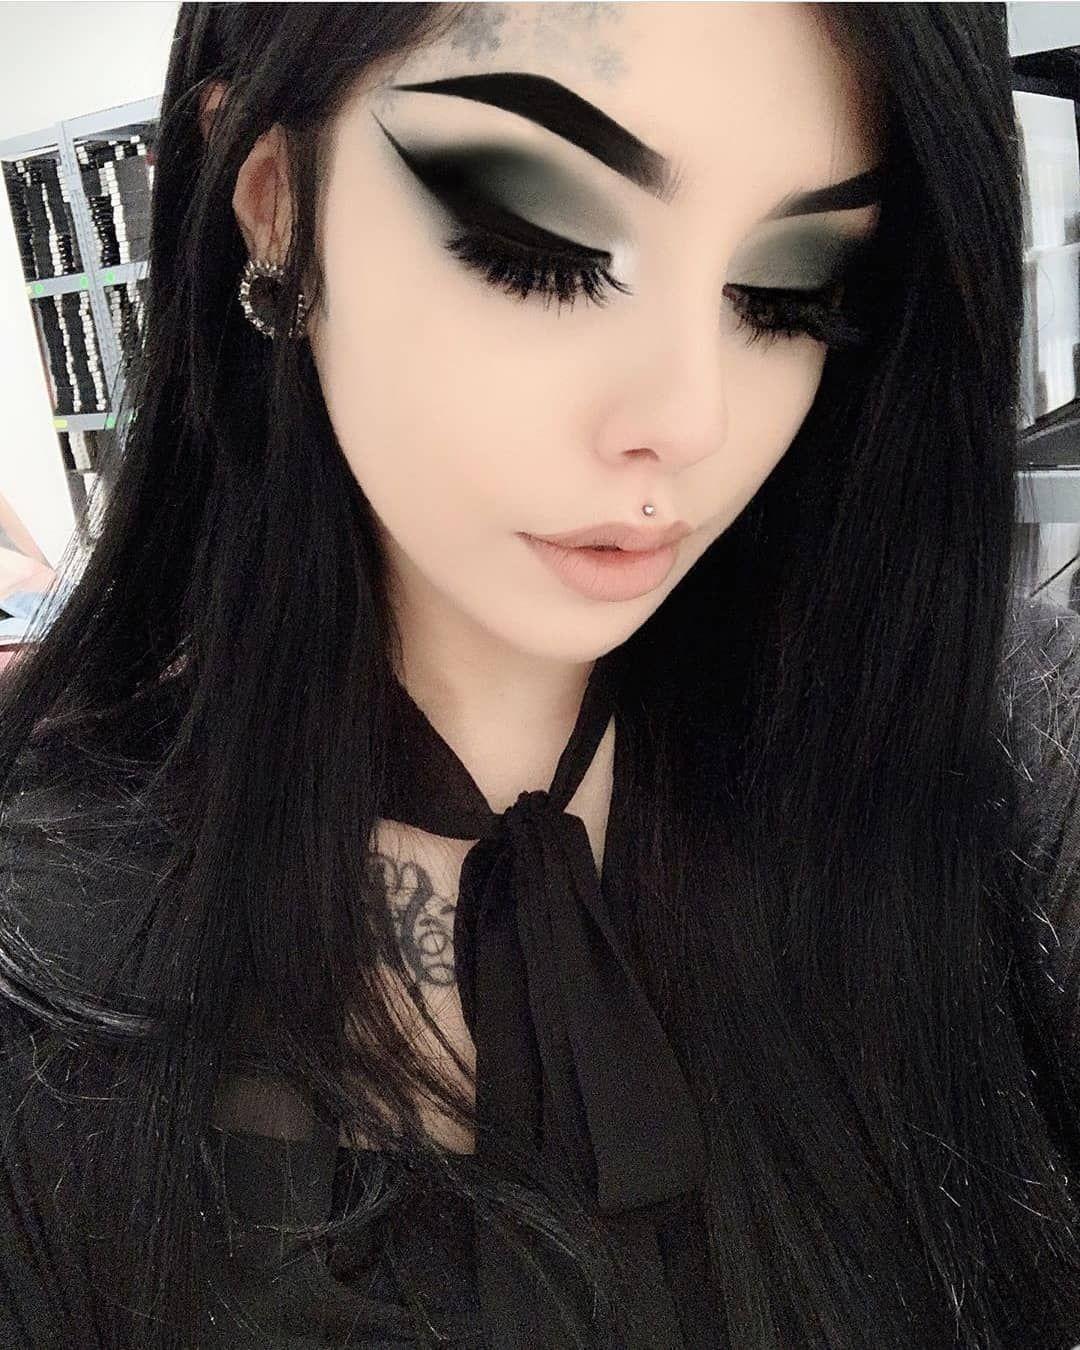 Morning Luvxtiine Goth Gothgirl Gothgoth